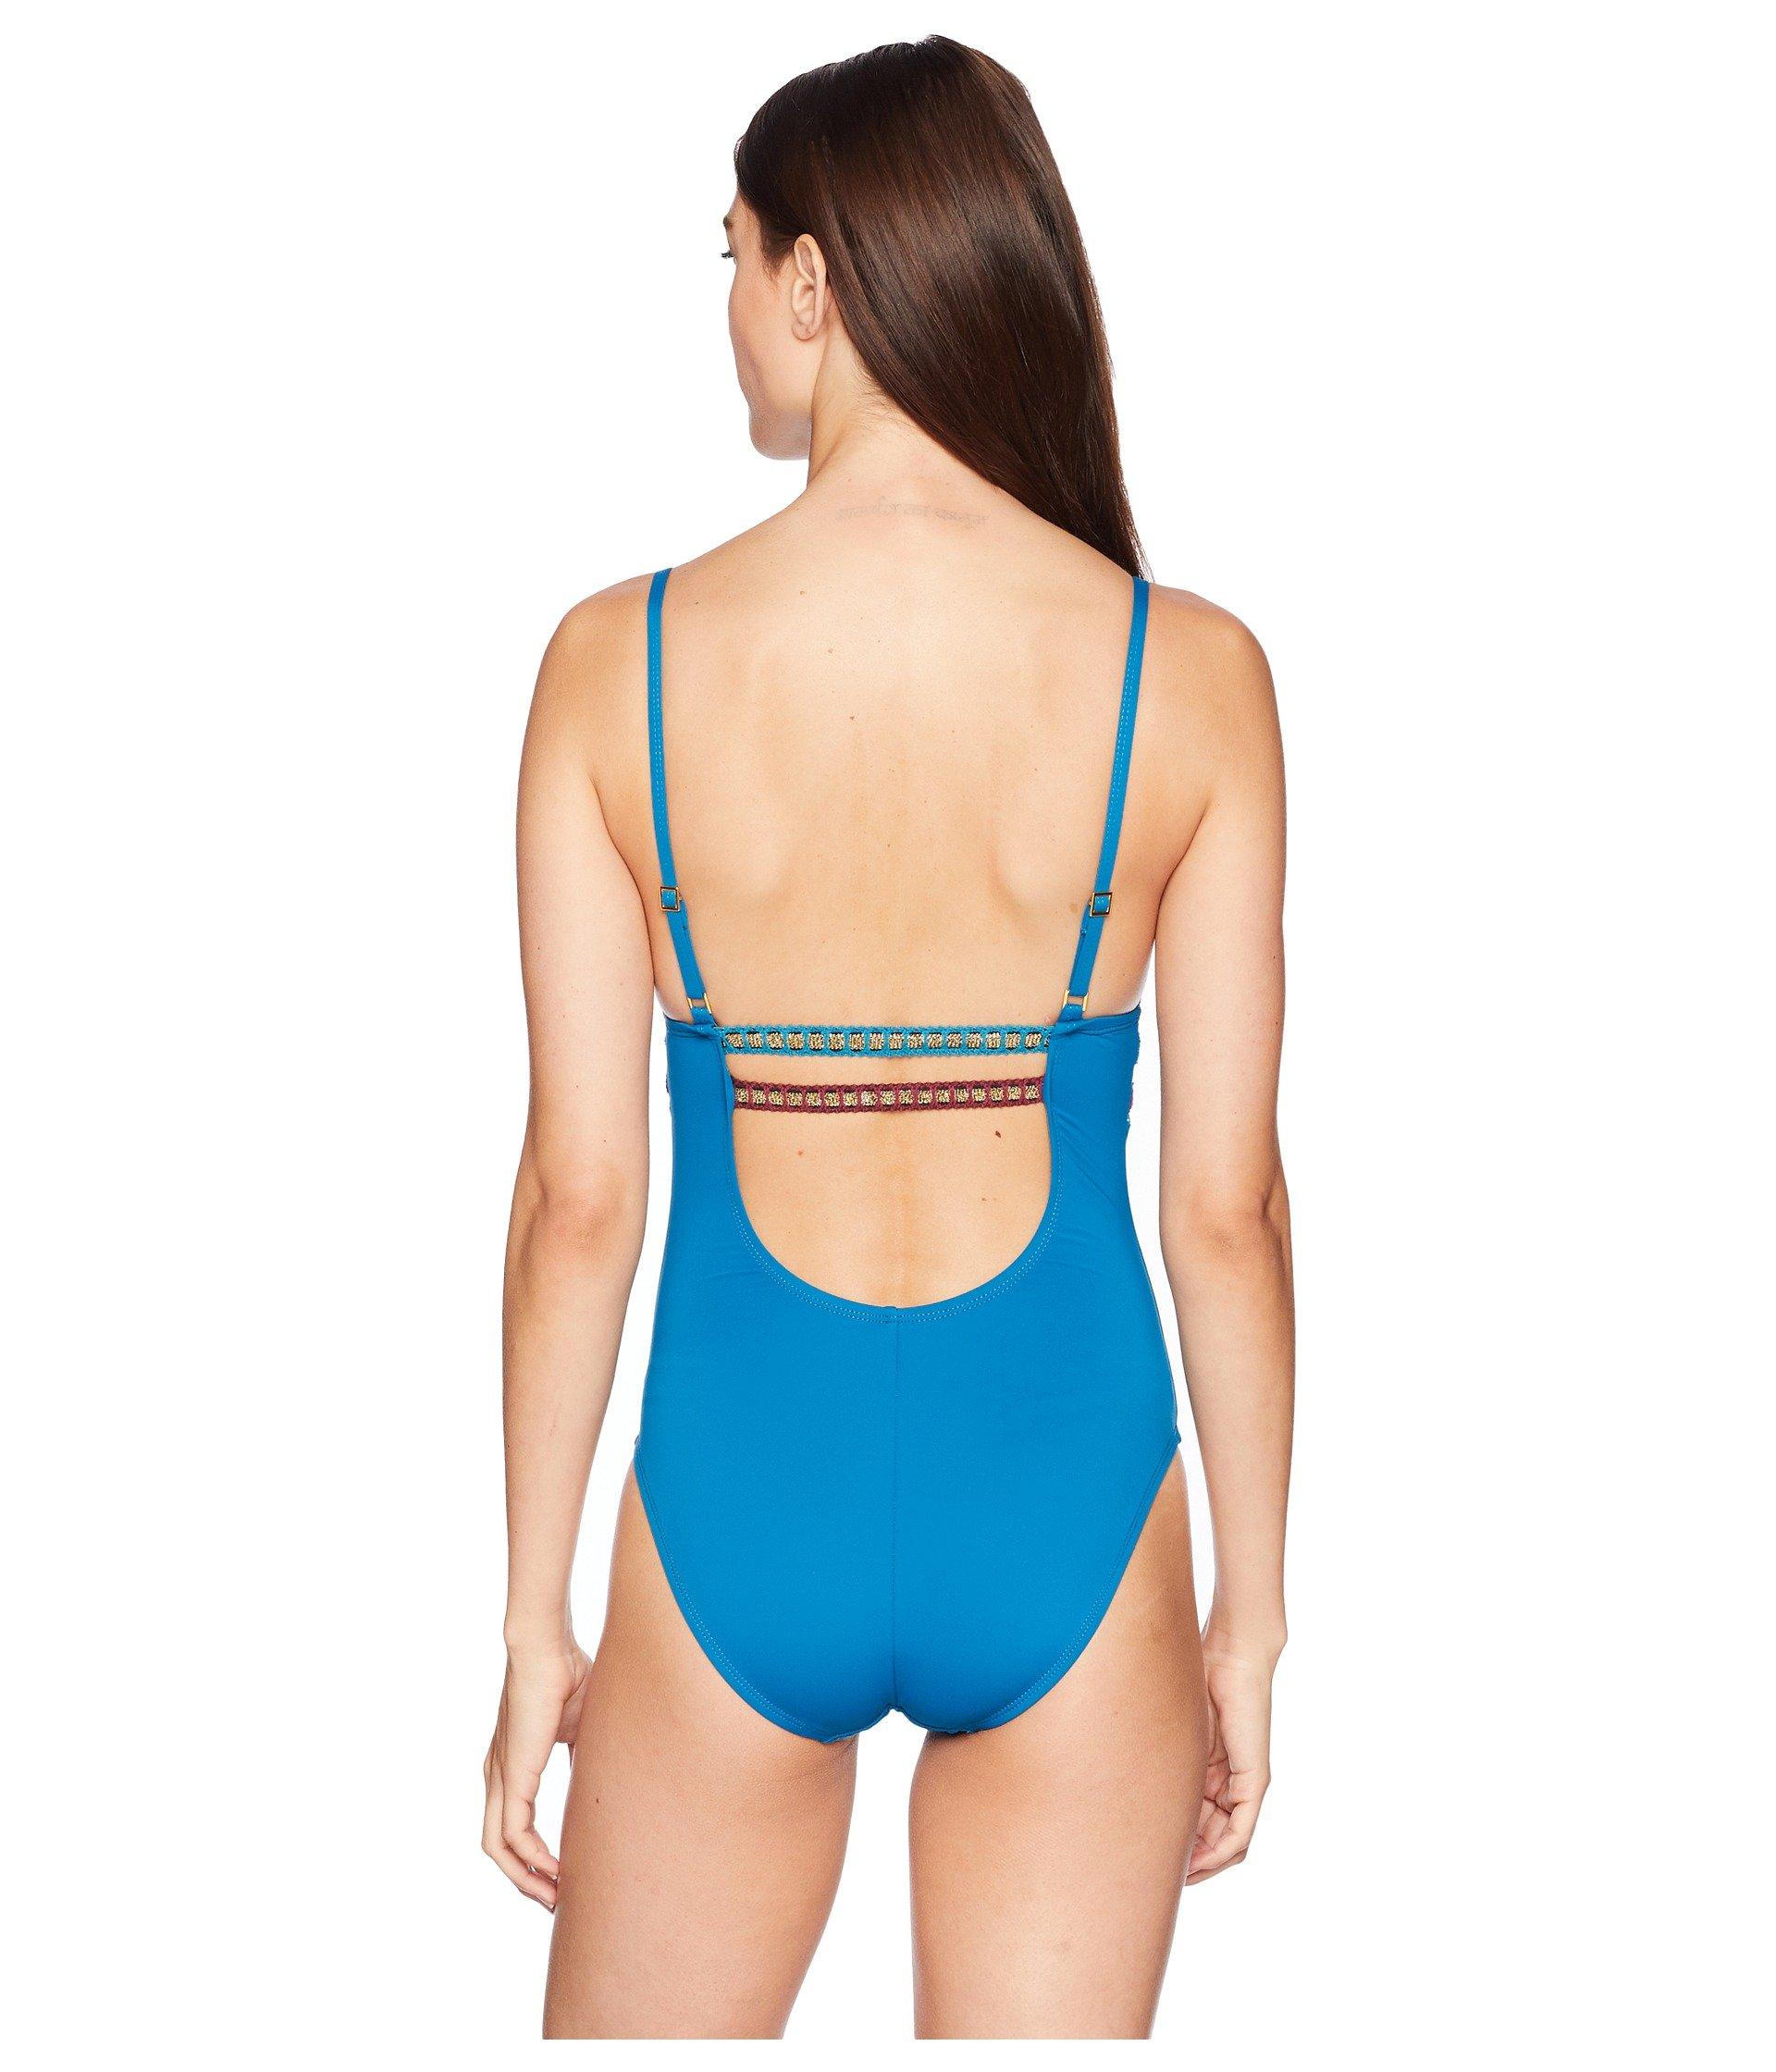 The Running Shoulder Blanca Mio piece Marina Over One Stitch Swimsuit La x1pn7x